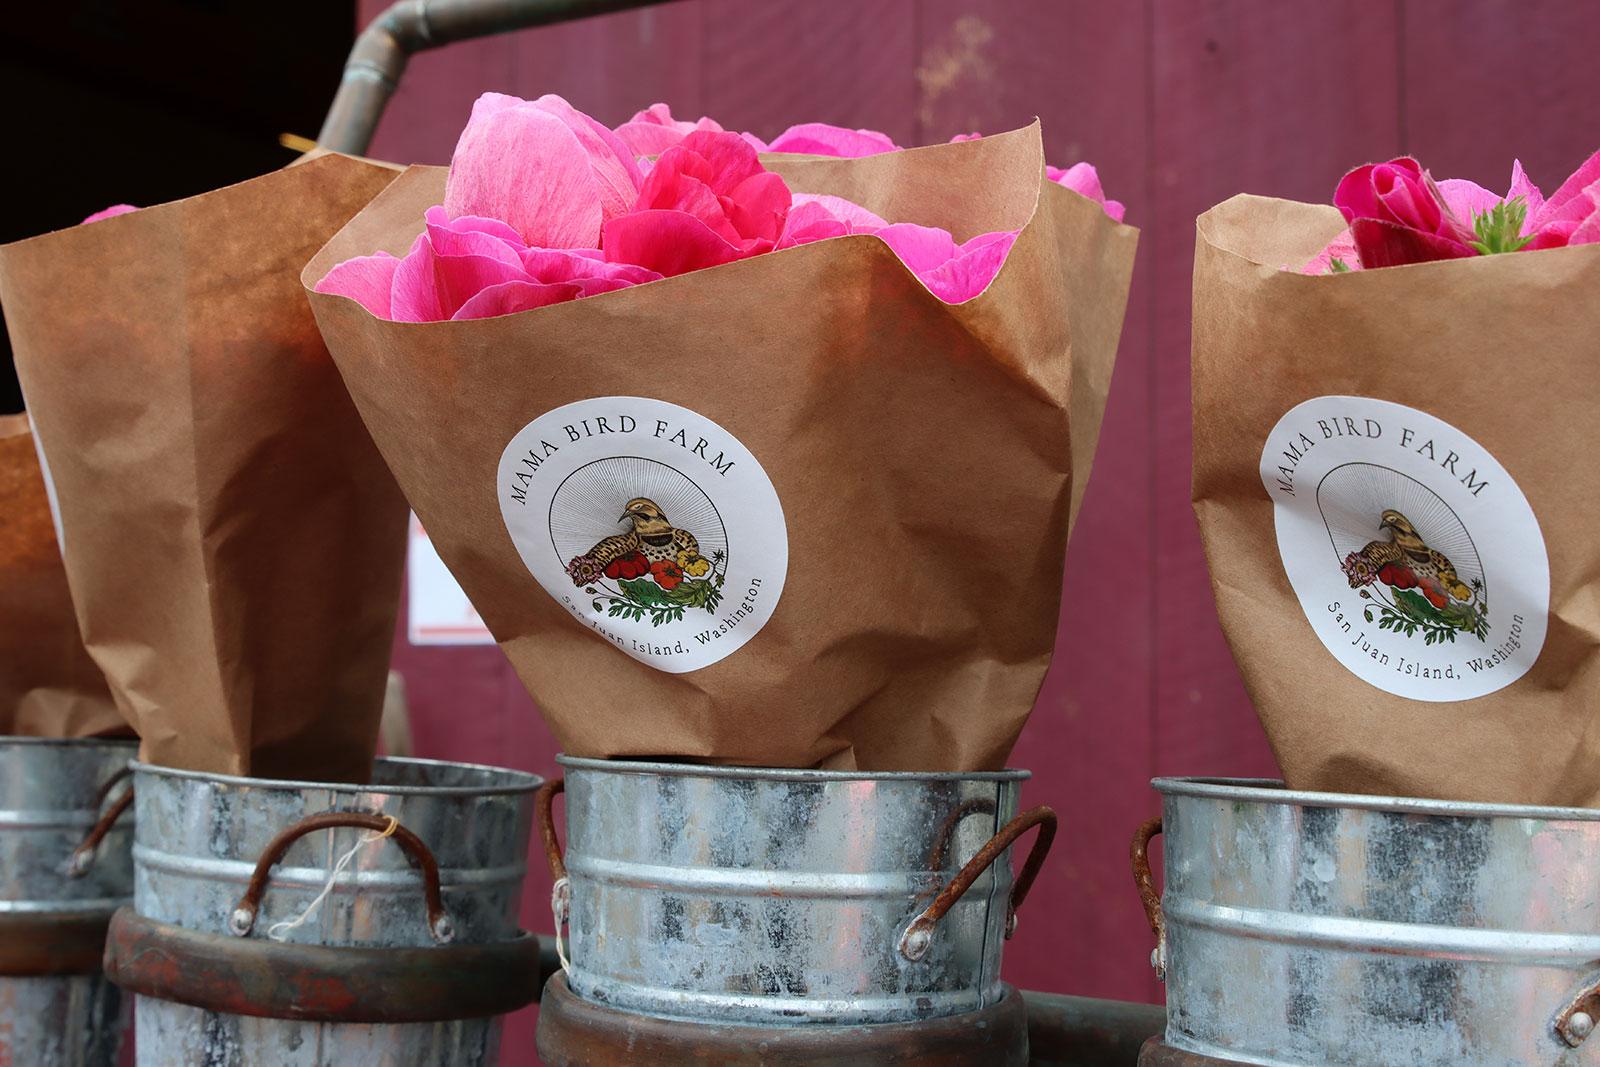 Mama Bird Farm bouquets